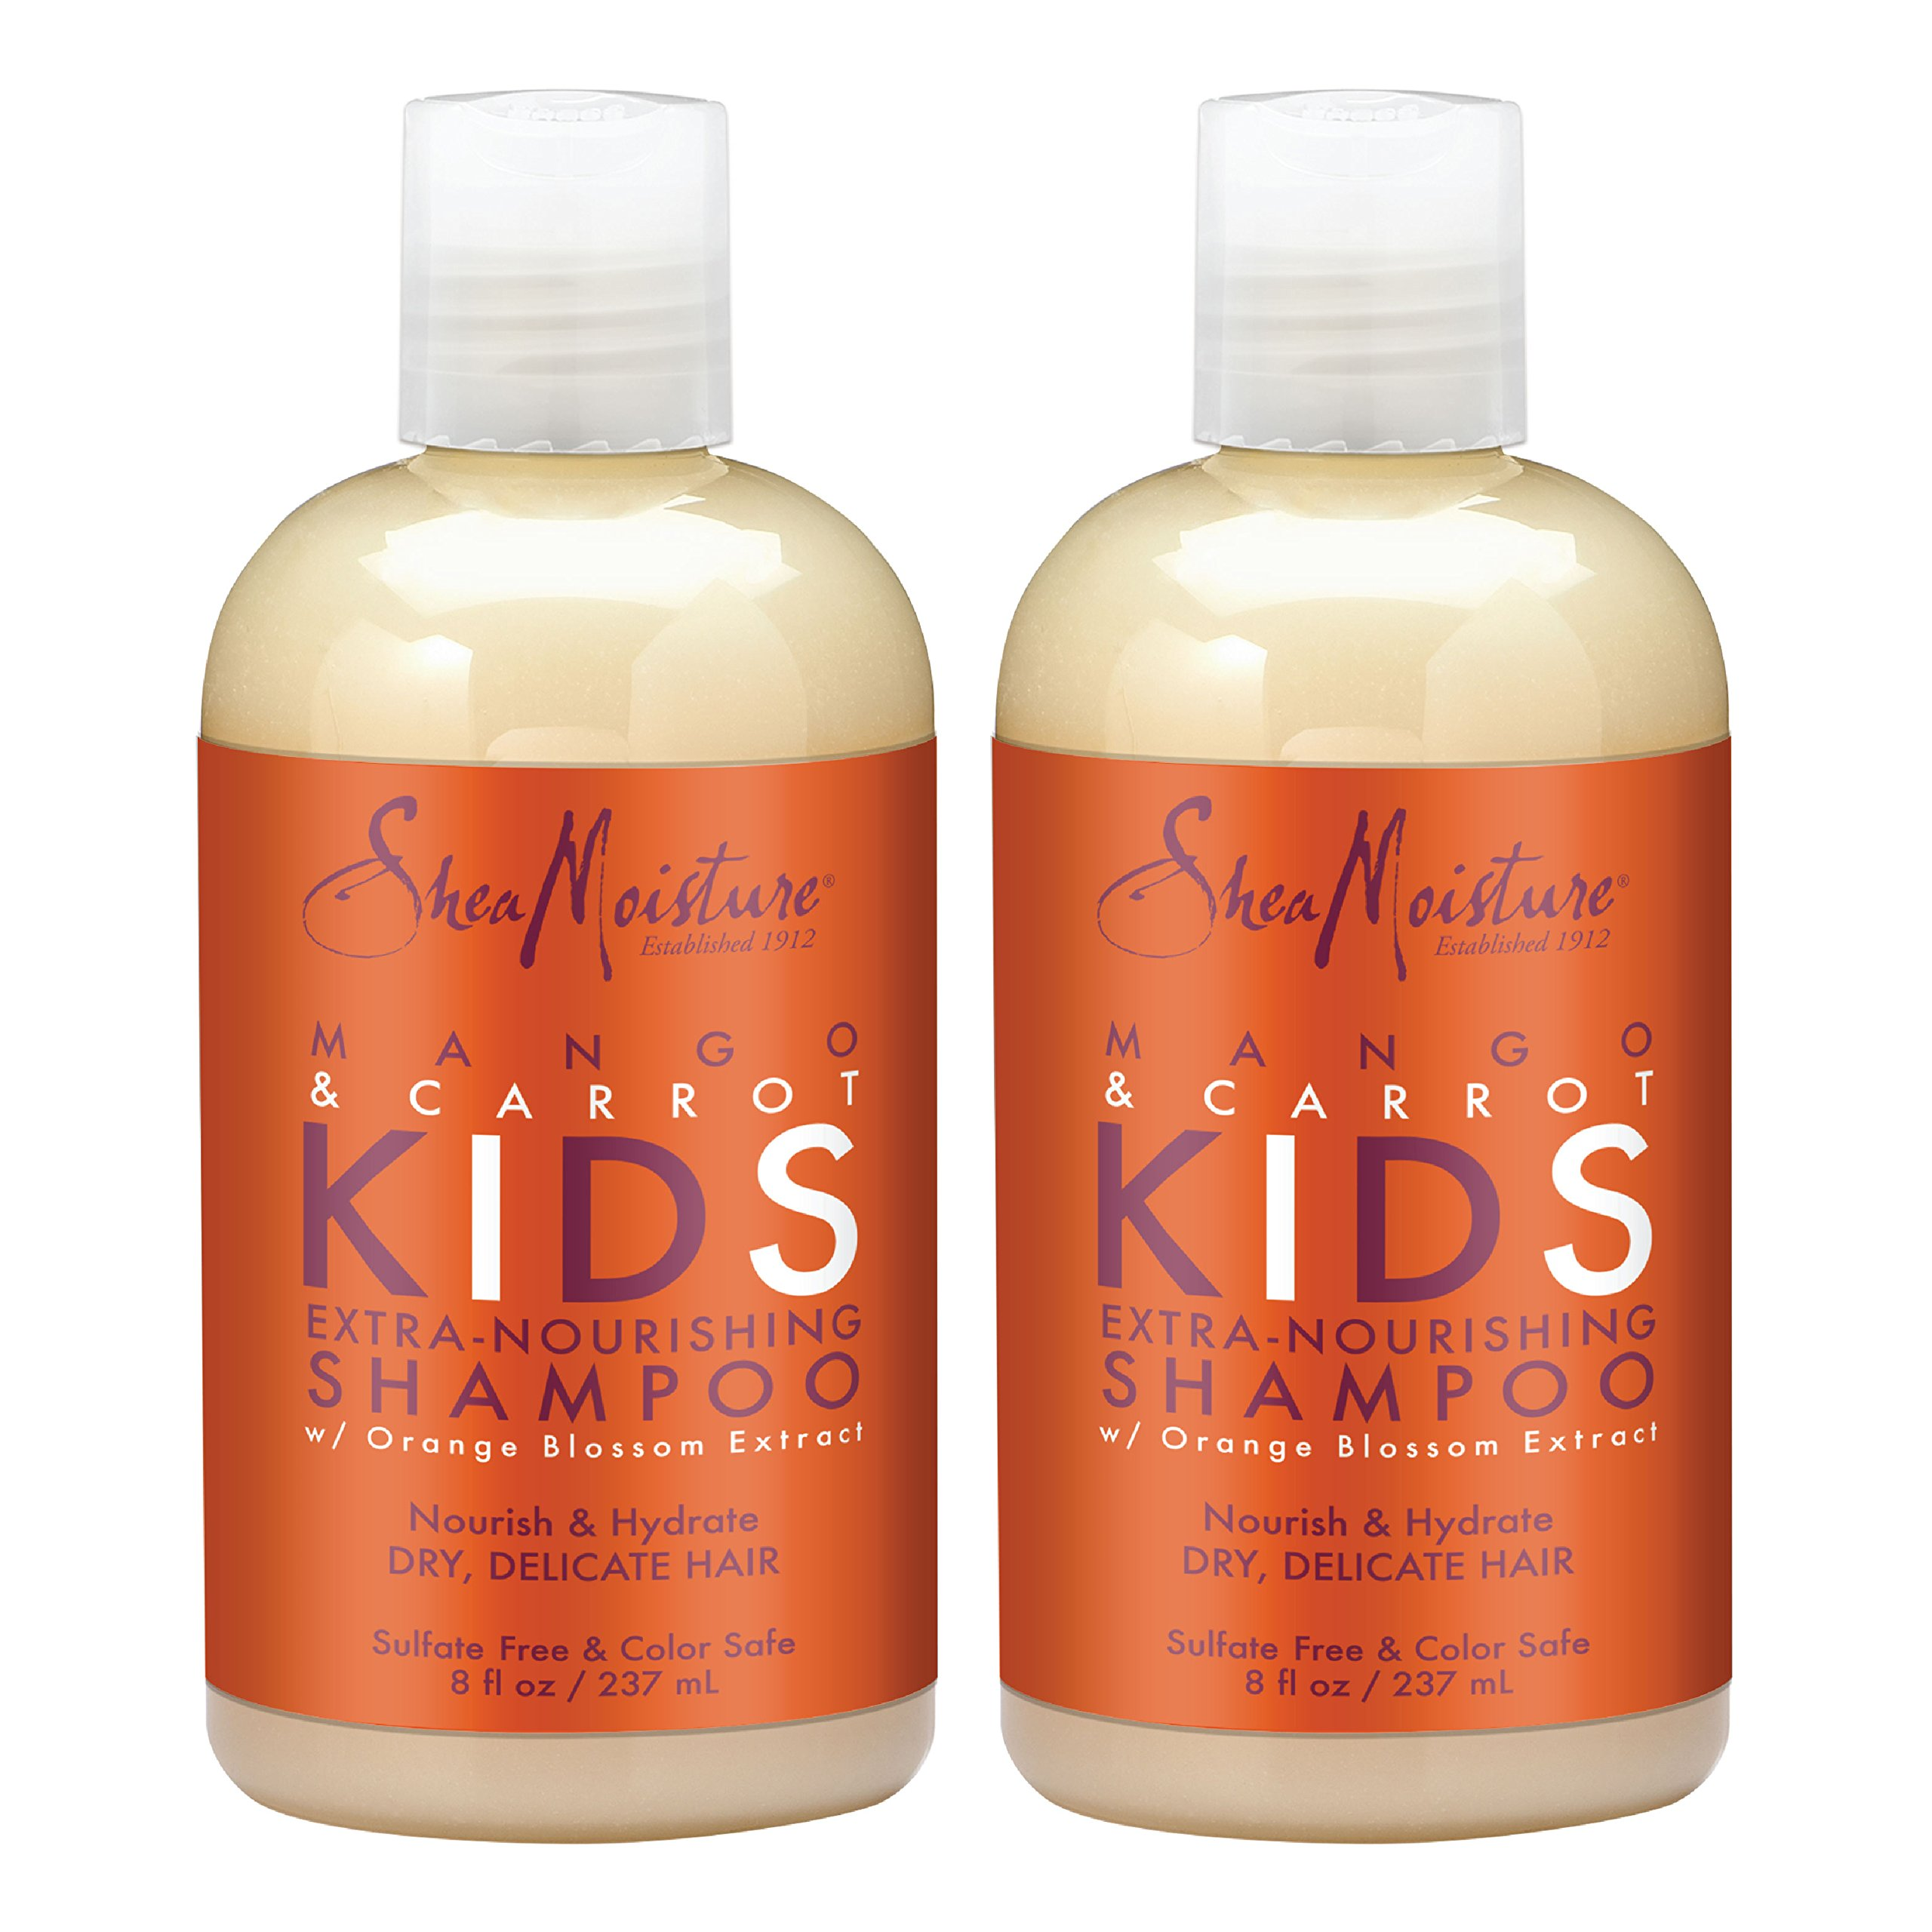 SheaMoisture Mango & Carrot KIDS, Extra-Nourishing Shampoo, Orange Blossom Extract, Dry, Delicate Hair, 8 fl oz, Pack of 2 by Shea Moisture